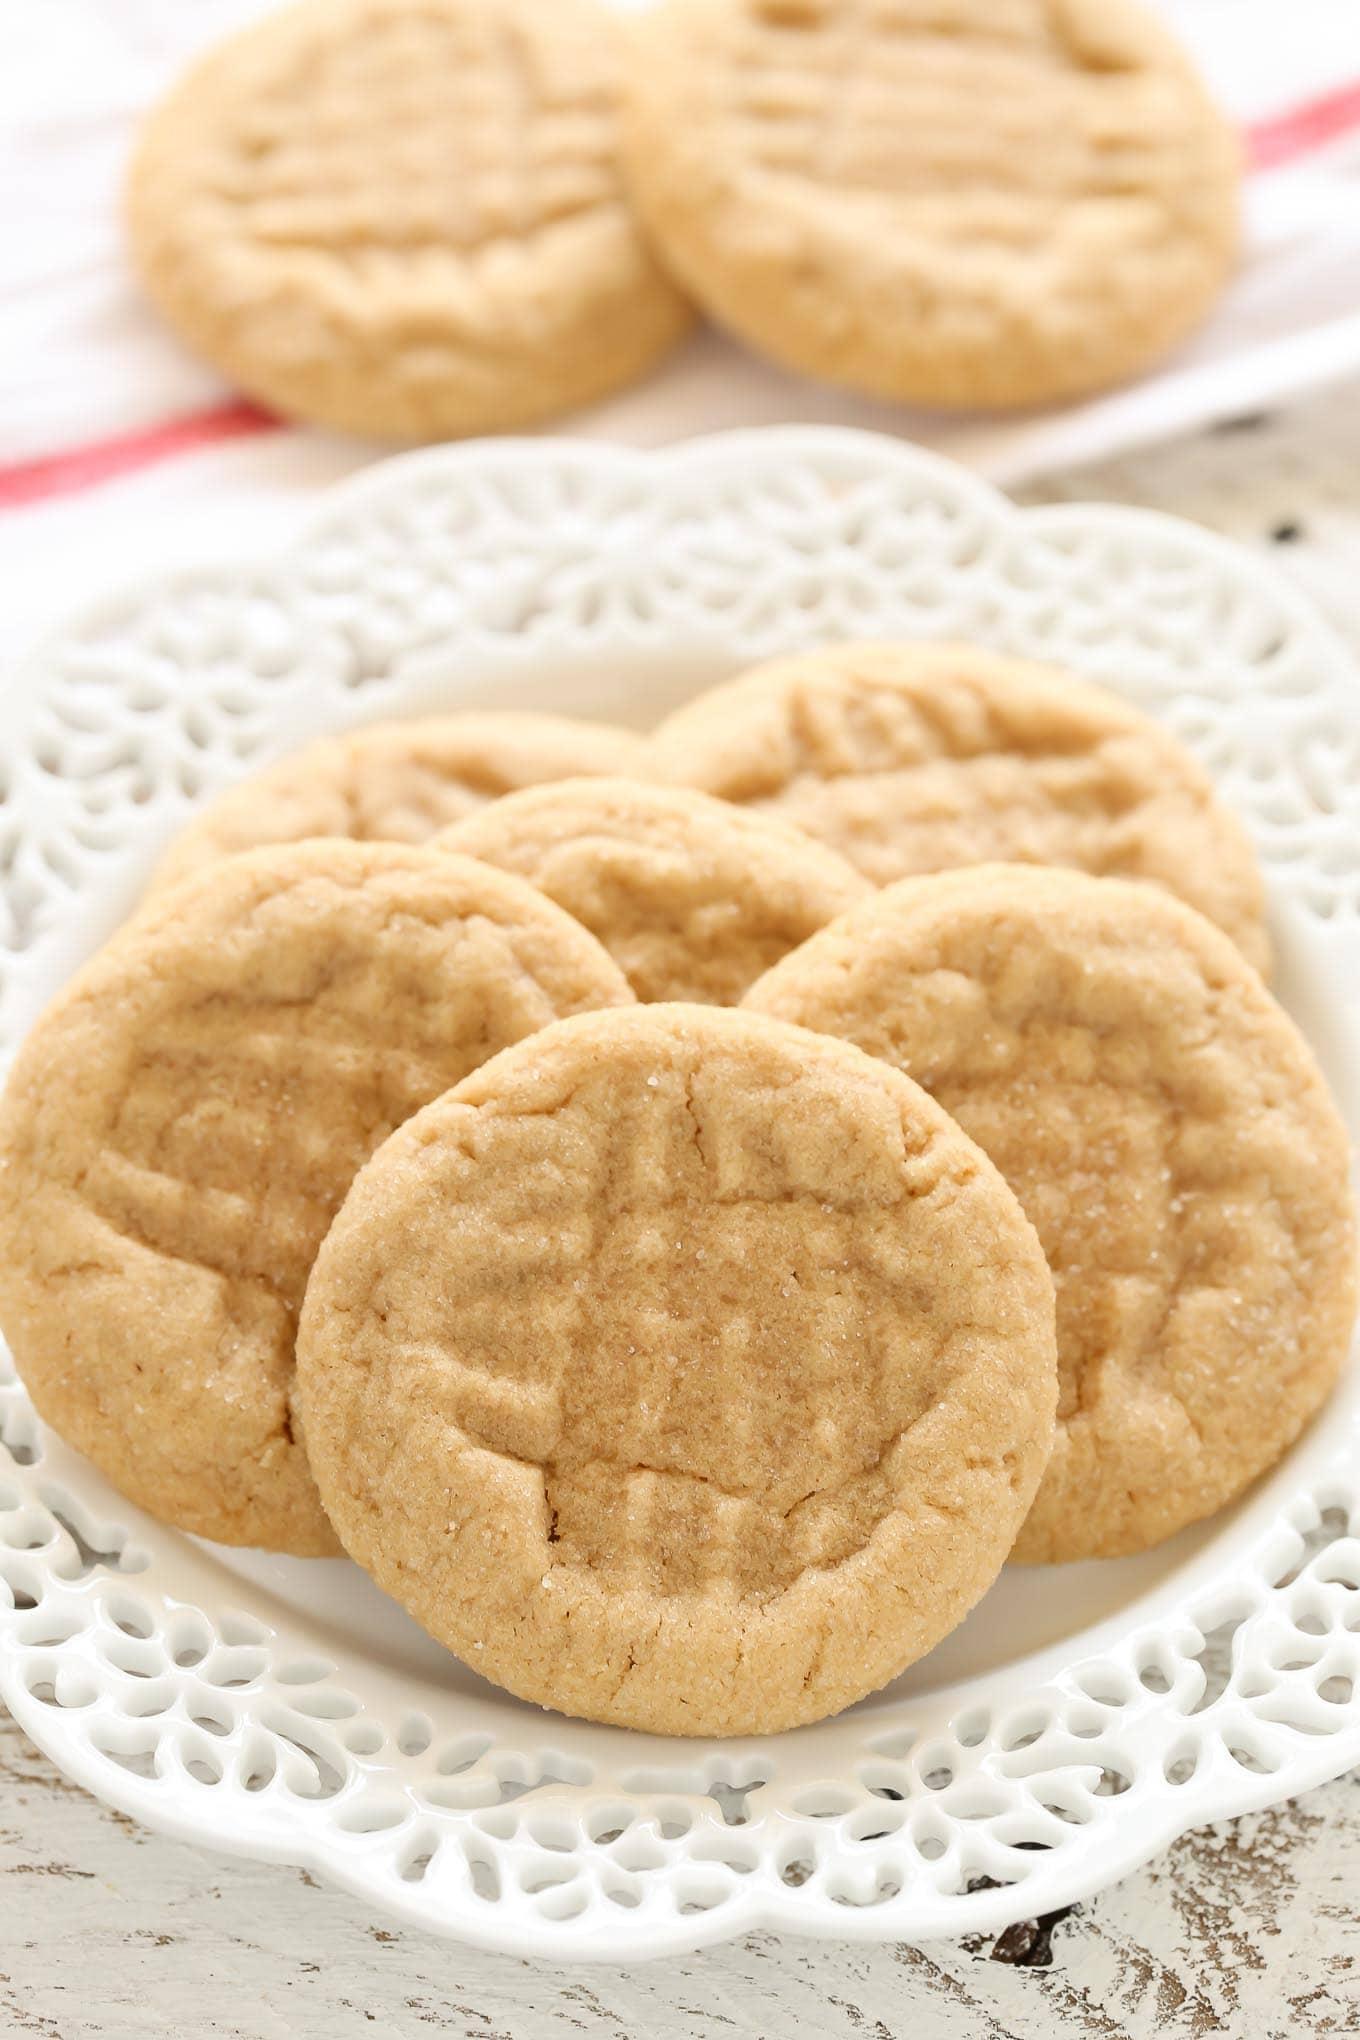 Comfy Se Soft Peanut Butter Cookies Are Easy To Full Peanut Soft Peanut Butter Cookies Live Well Bake Often No Egg Cookies Plain Flour No Egg Cookies Easy nice food No Egg Cookies